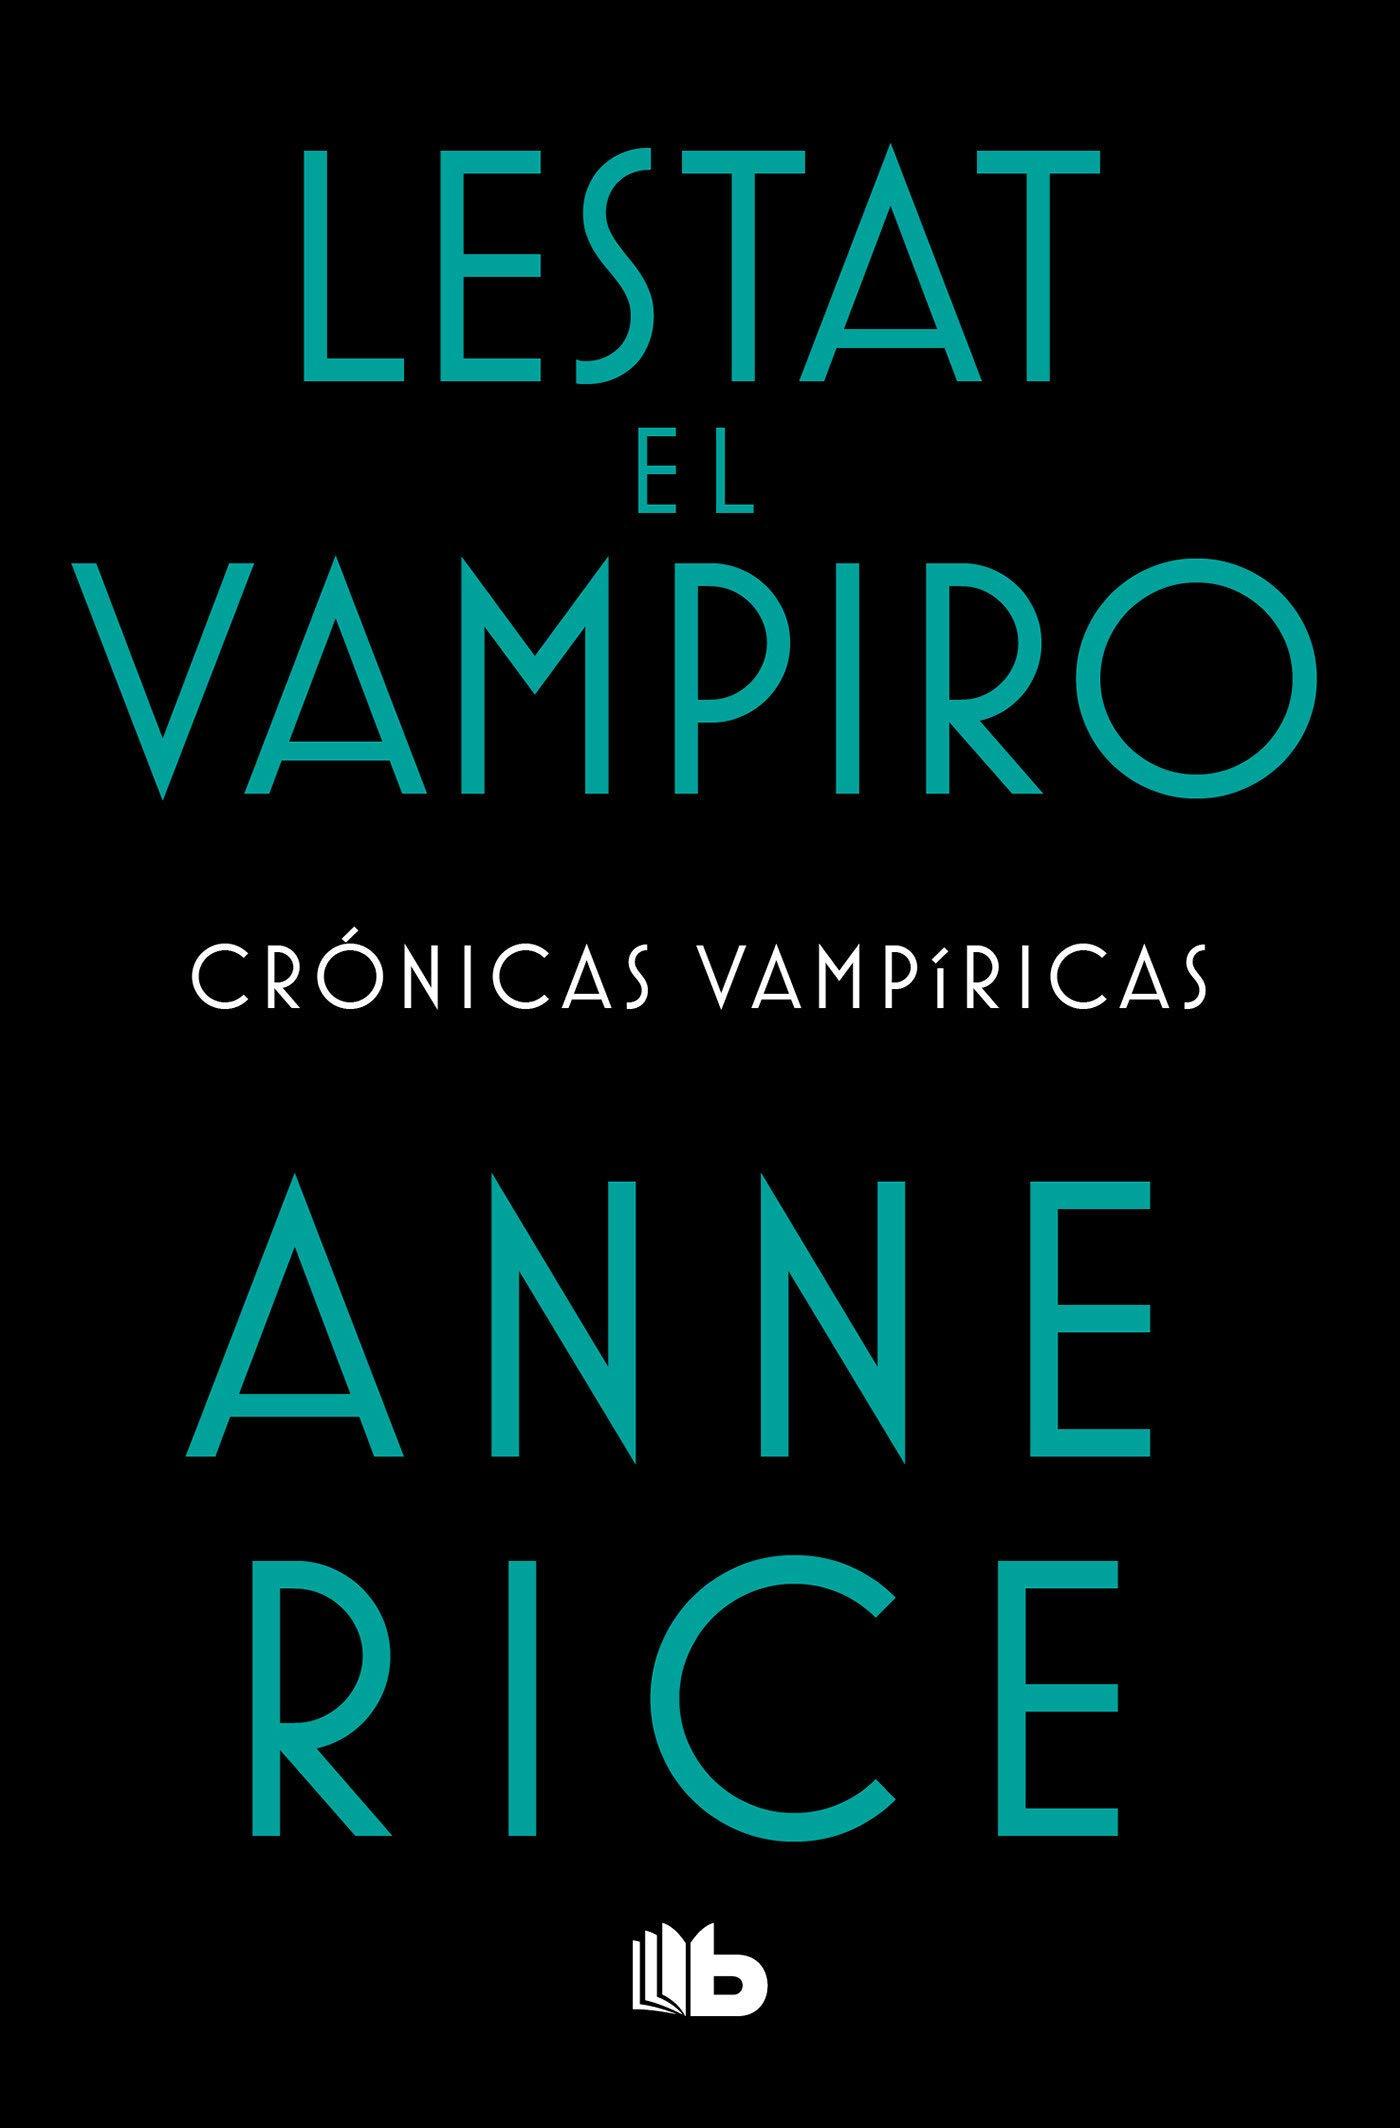 Lestat El Vampiro / The Vampire Lestat Tapa blanda – 23 abr 2019 Anne Rice EDICIONES BARATARIA 6073168942 FICTION / Fantasy / General